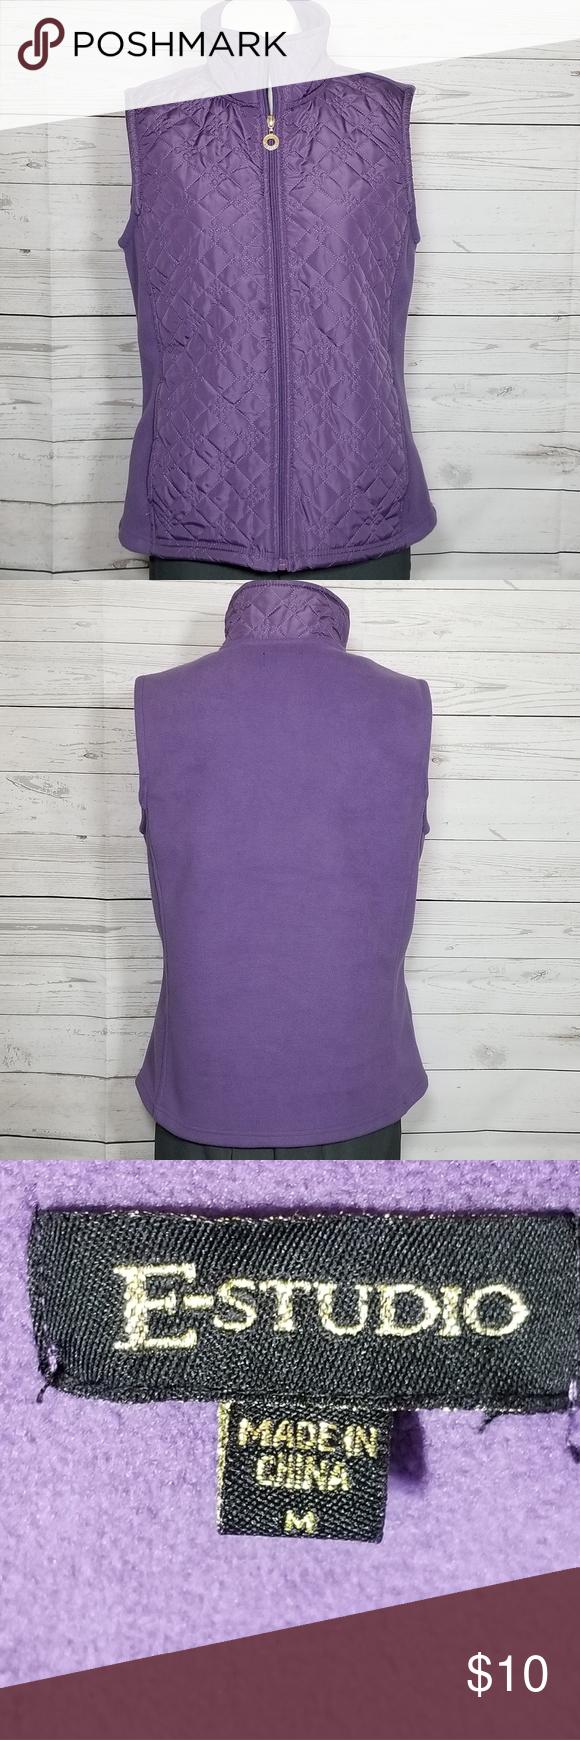 🌼E Studio Womens Quilted Vest Size Medium